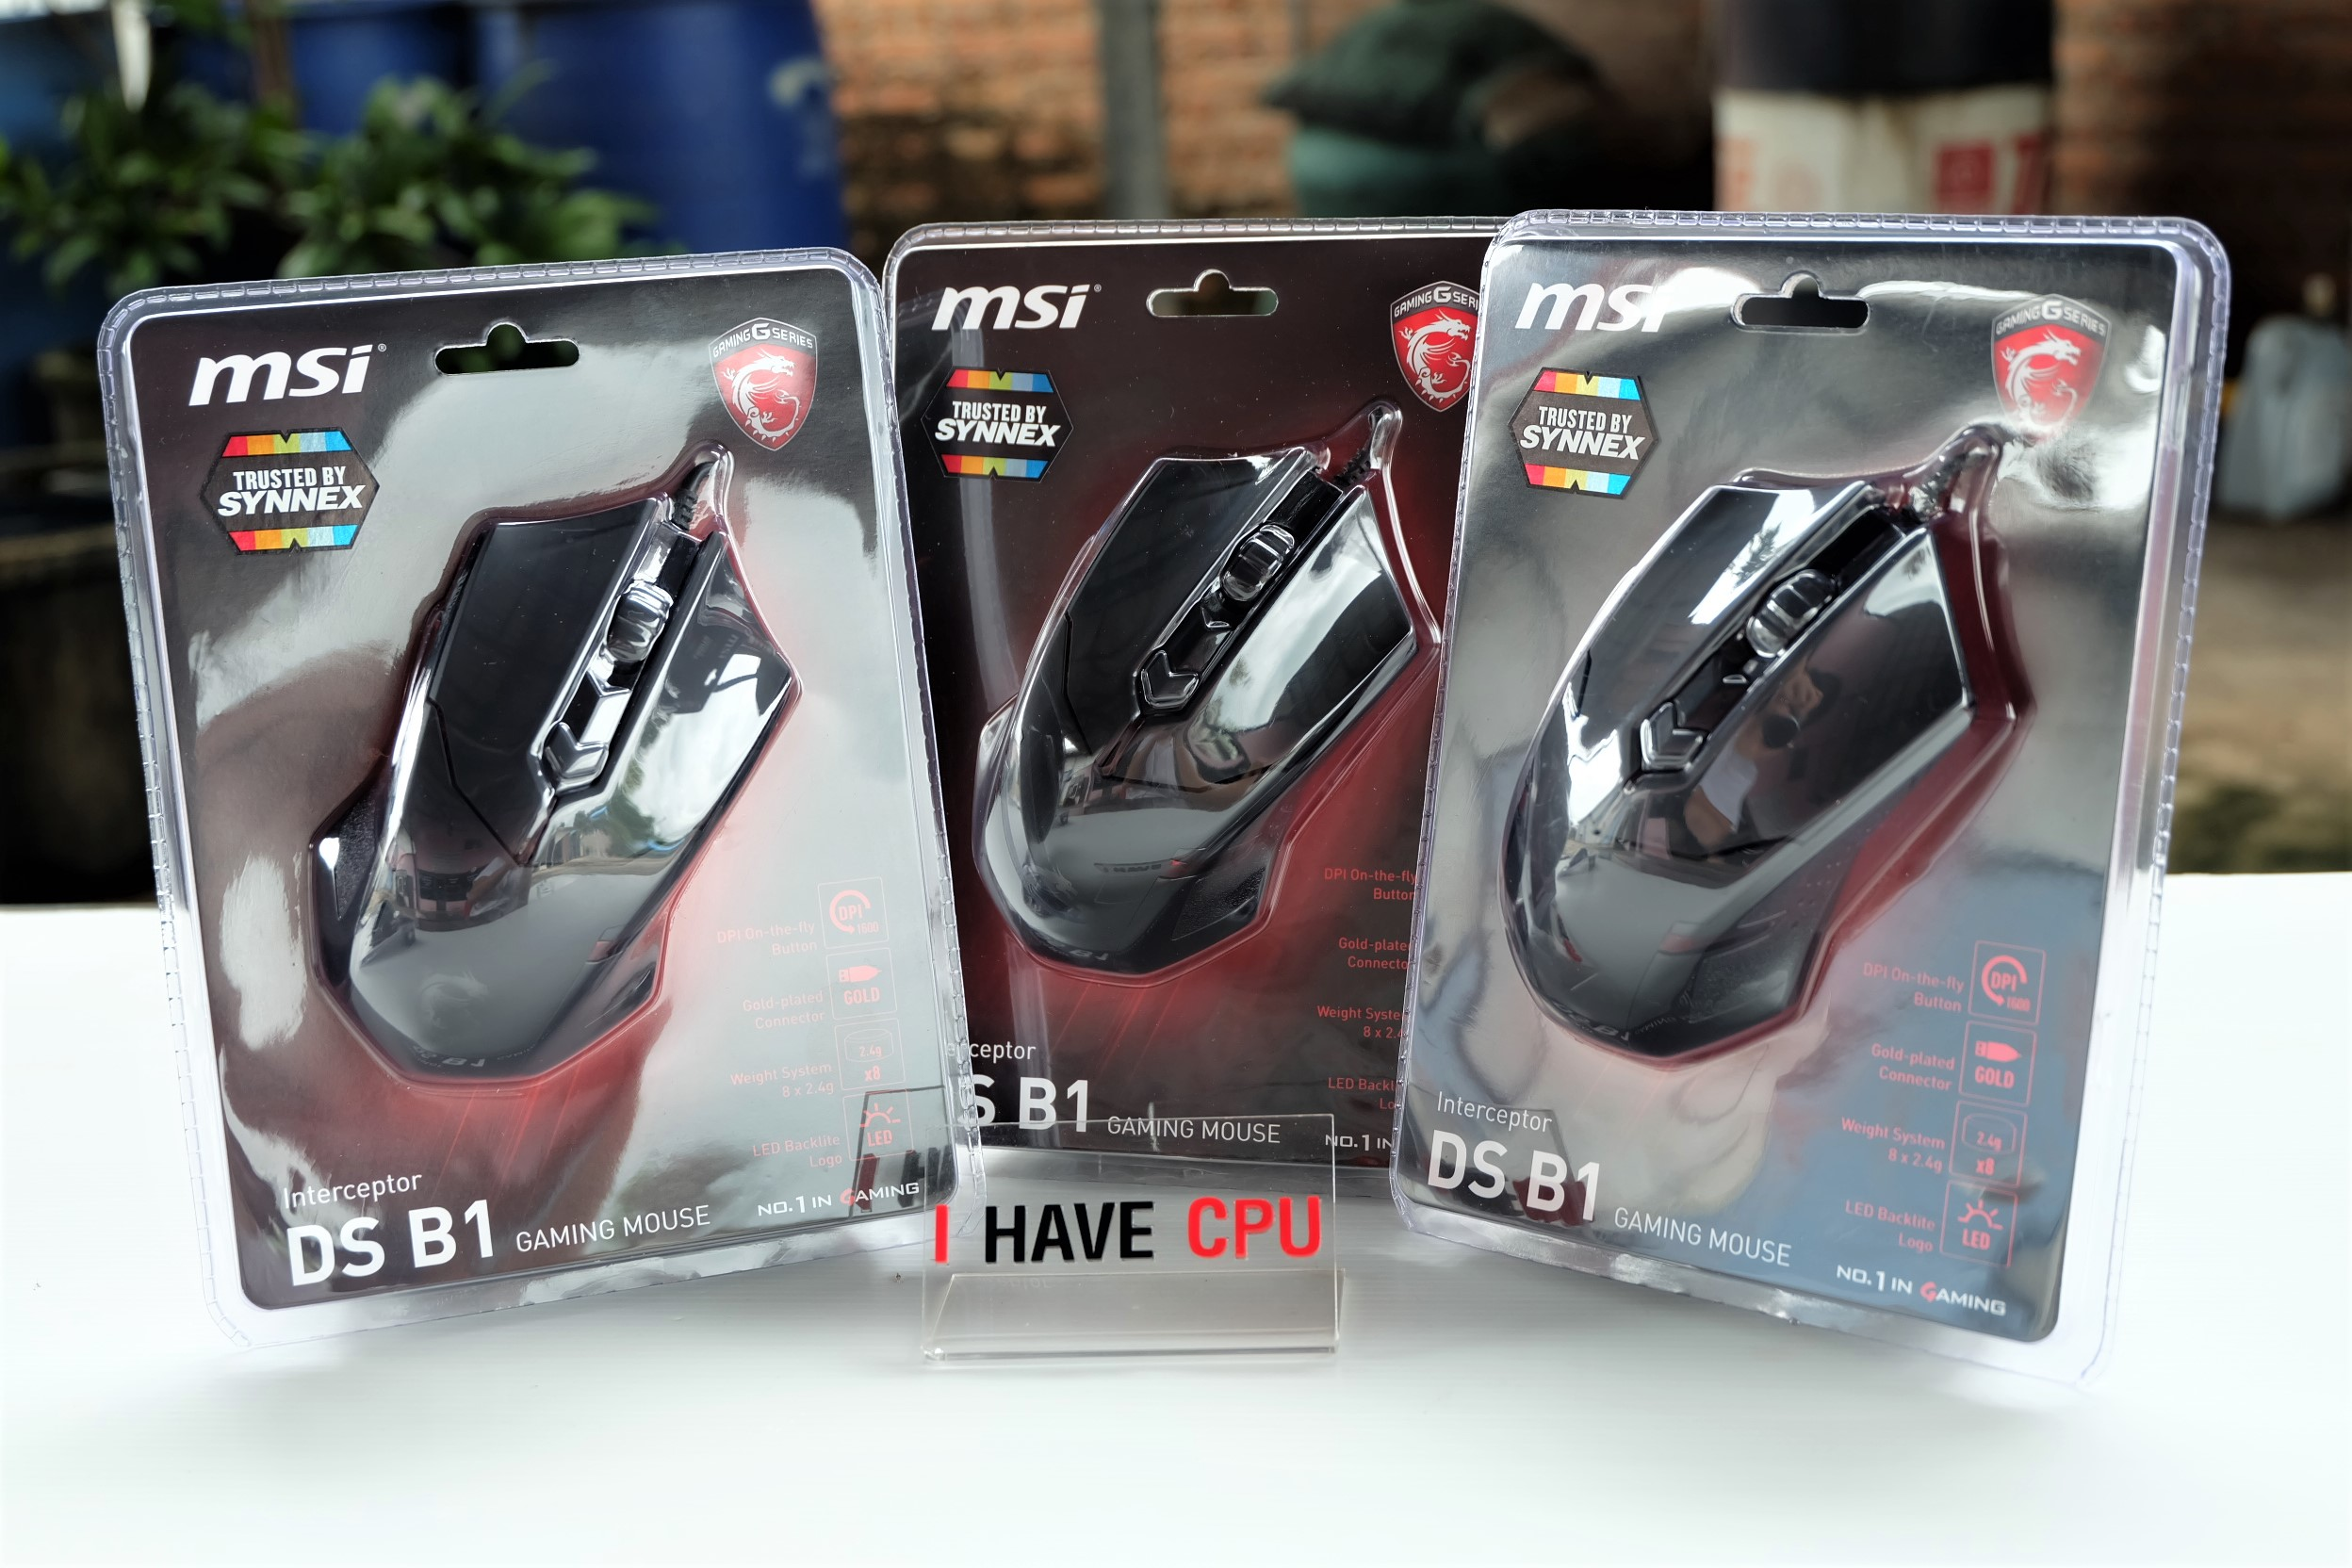 Interceptor MSI DS B1 Gaming Mouse